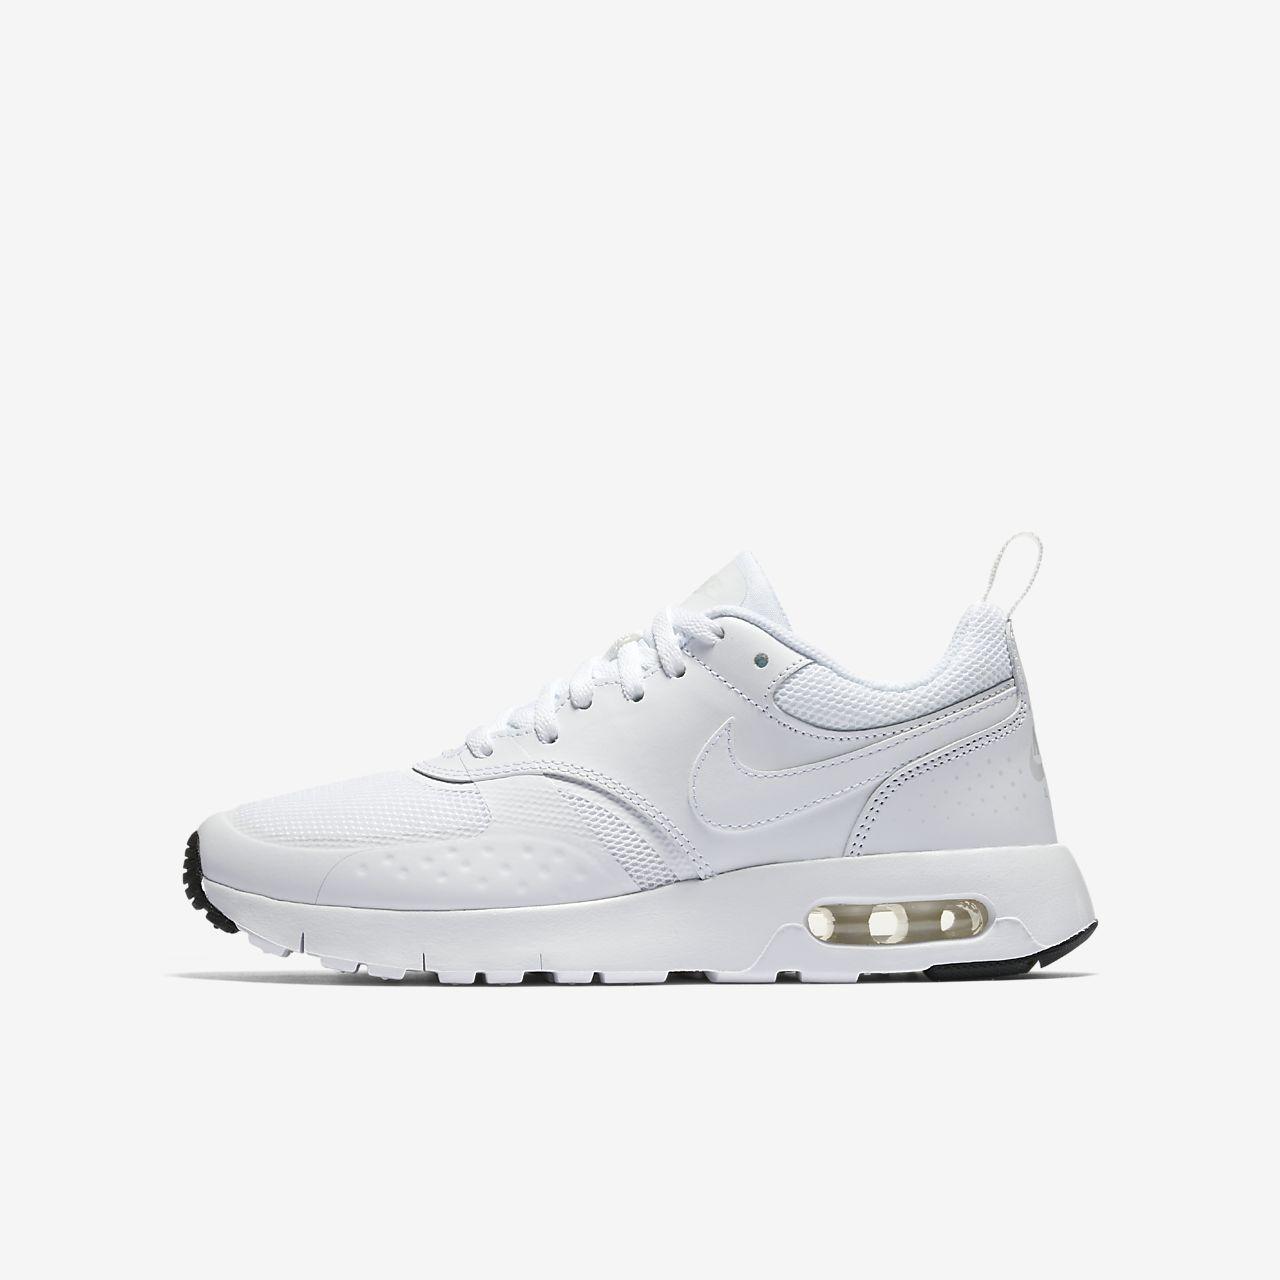 Nike Air Max Vision Schuh für ältere Kinder